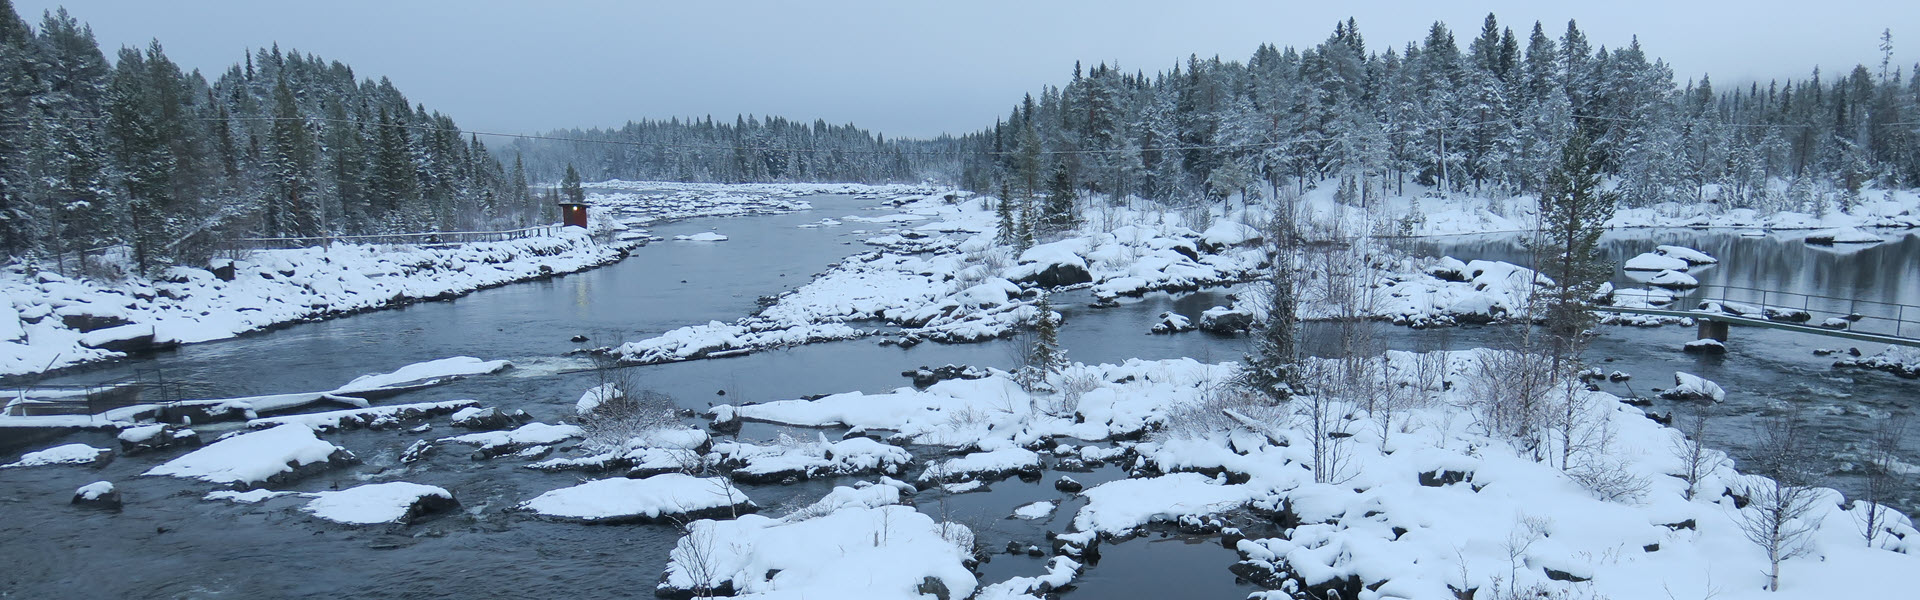 Gäddede Camping contact winter